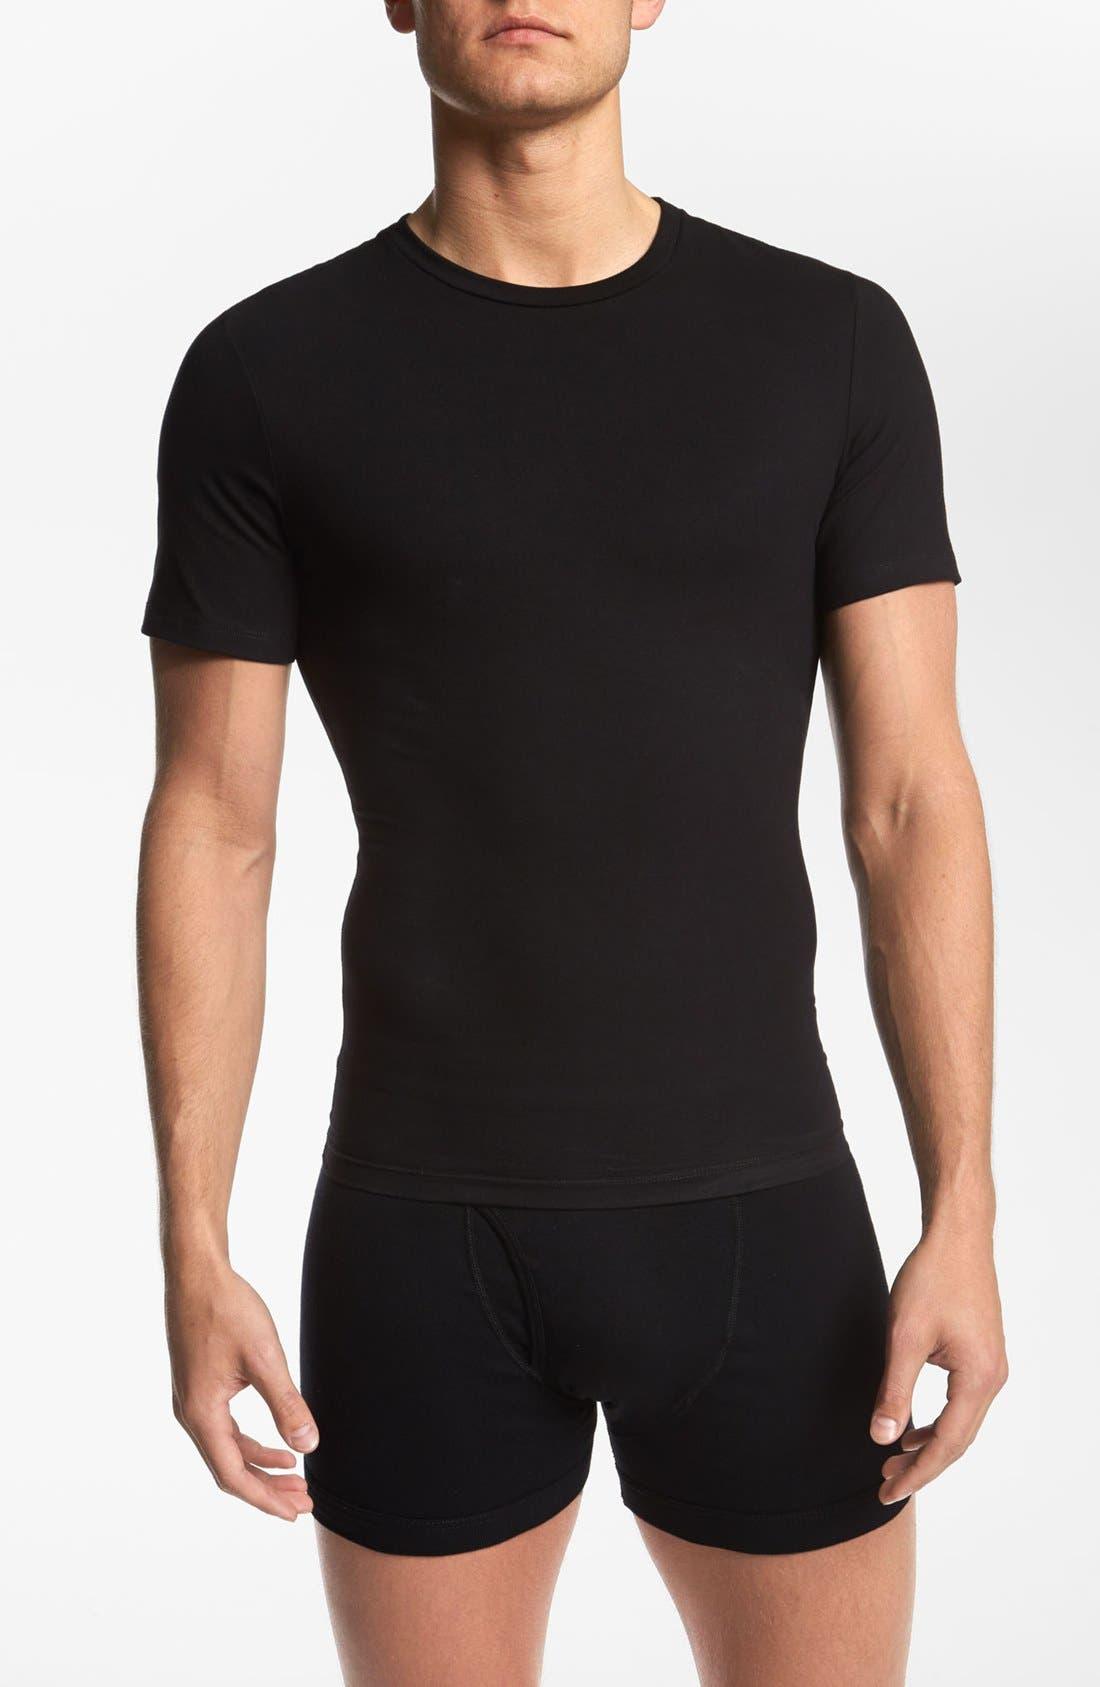 Alternate Image 1 Selected - SPANX® Crewneck Cotton Compression T-Shirt